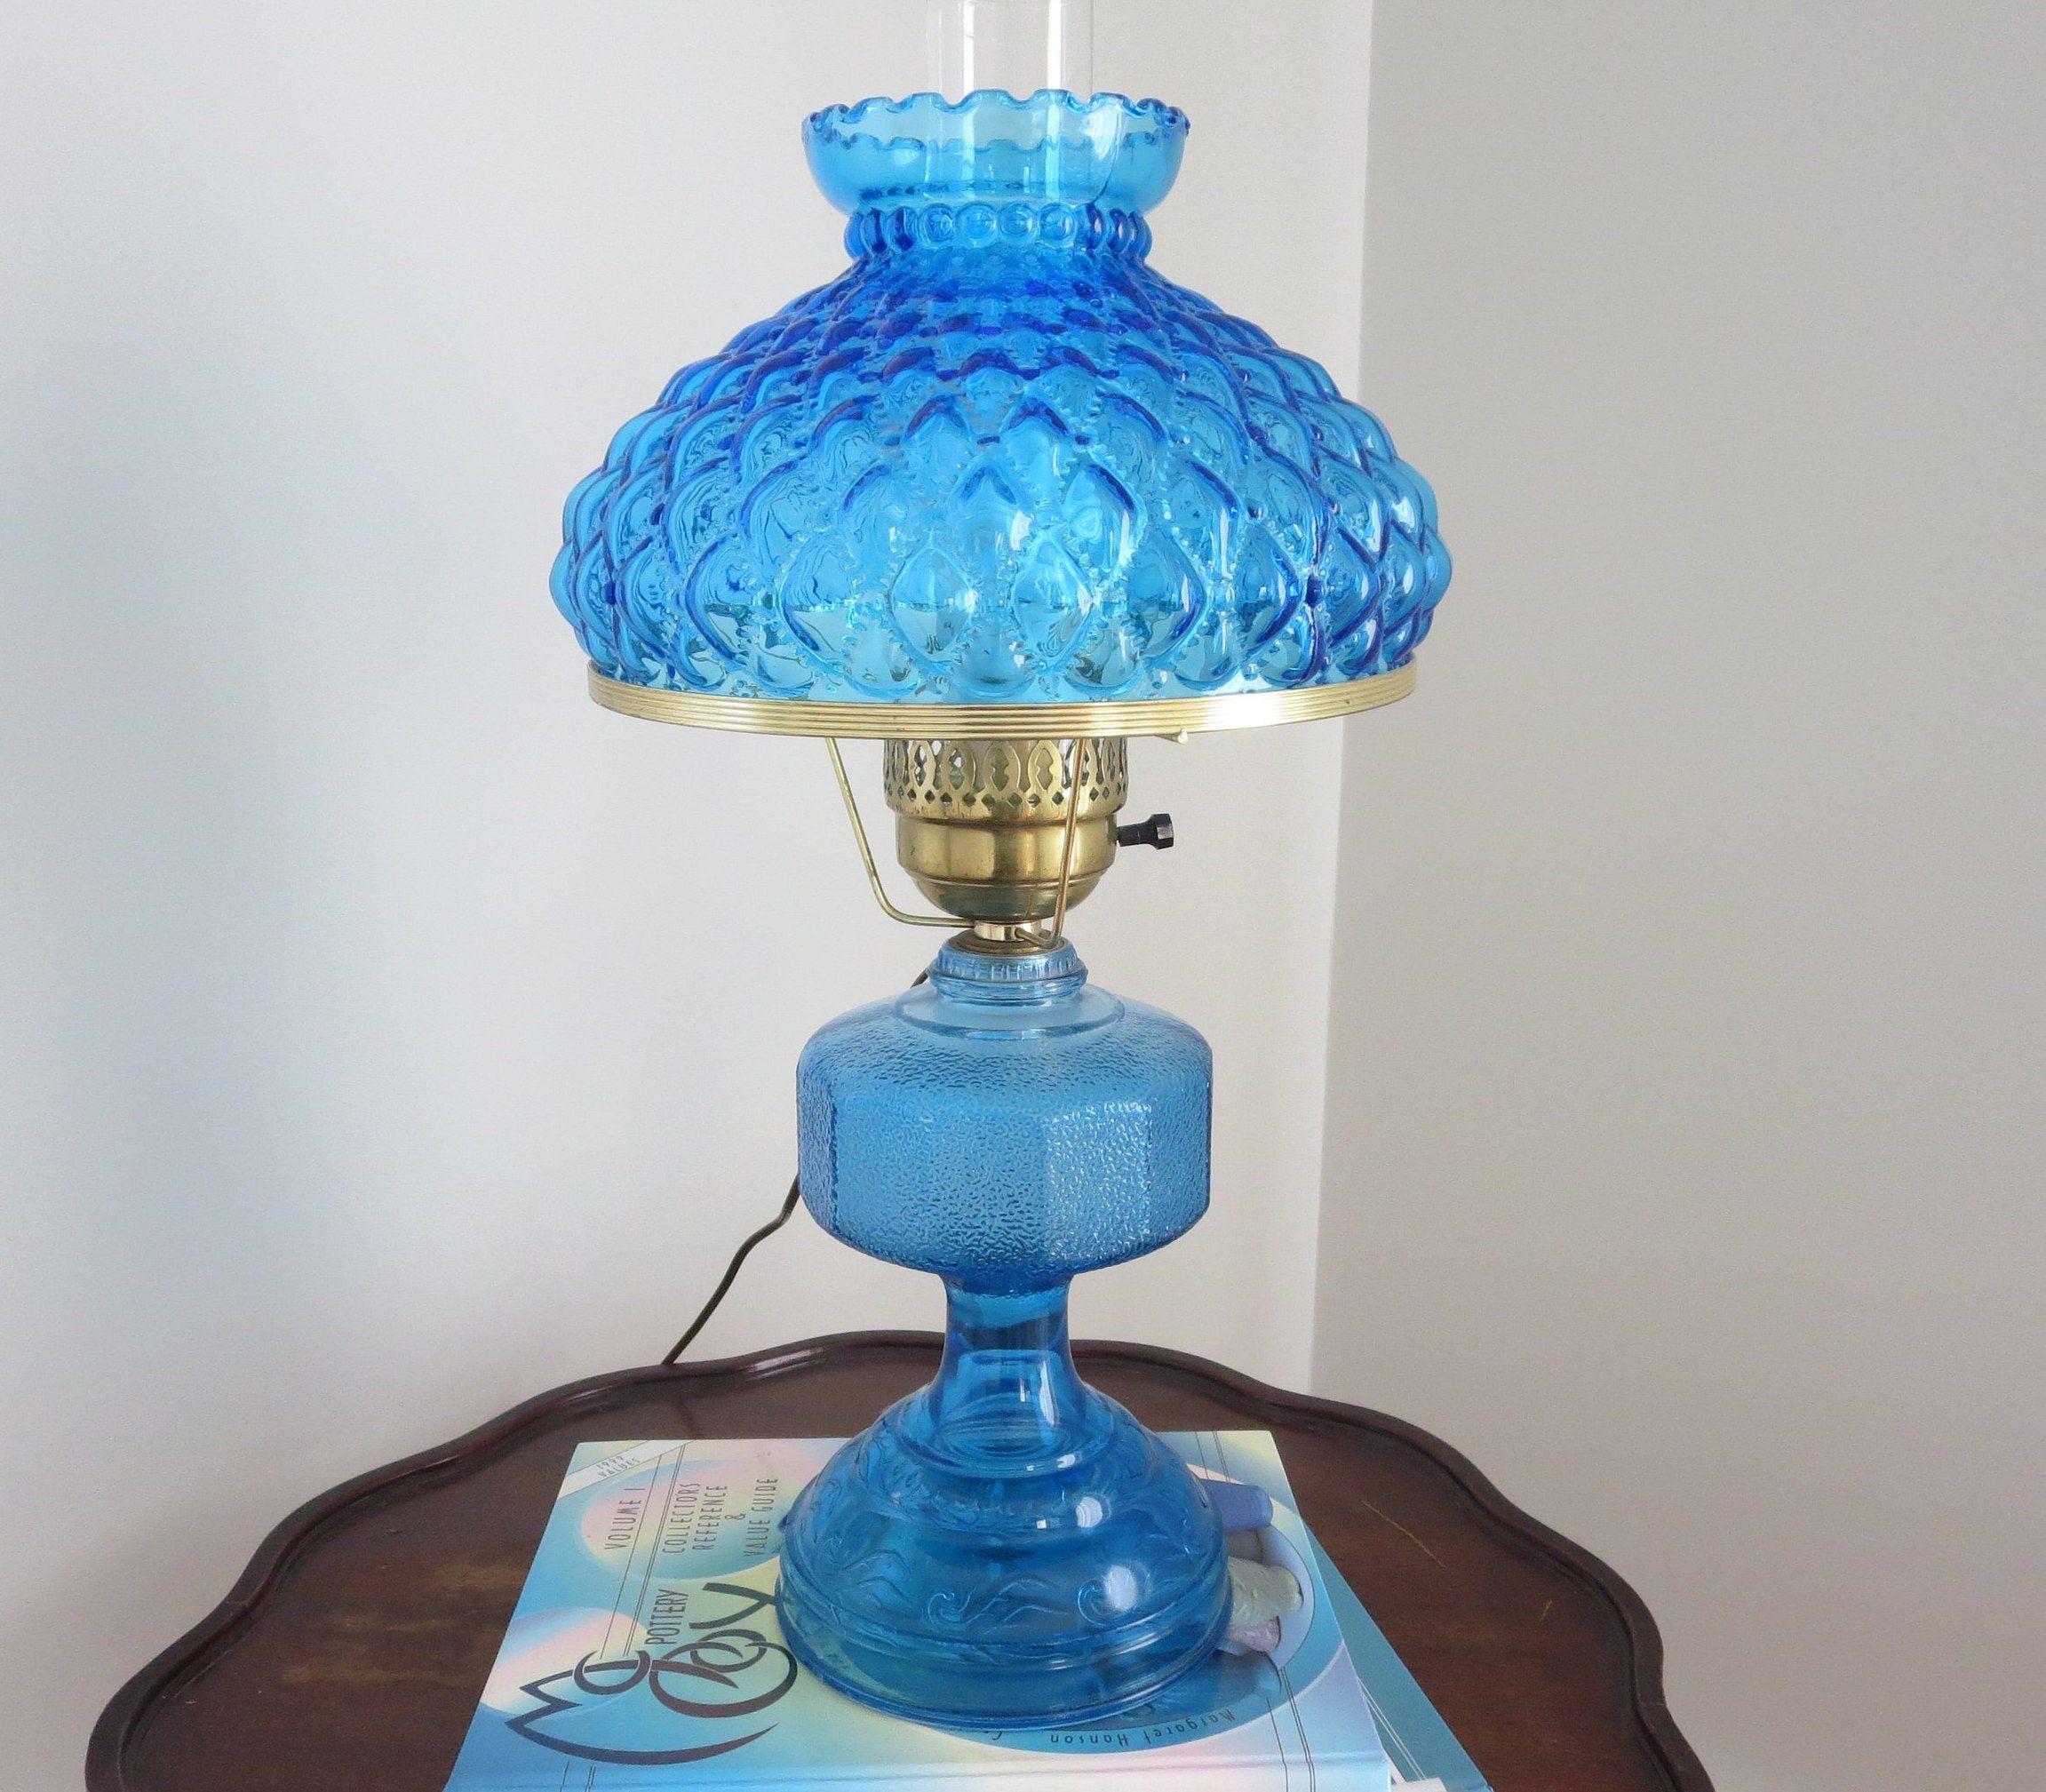 Vintage Electrified Hurricane Oil Lamp, Blue Hurricane Lamp Shade